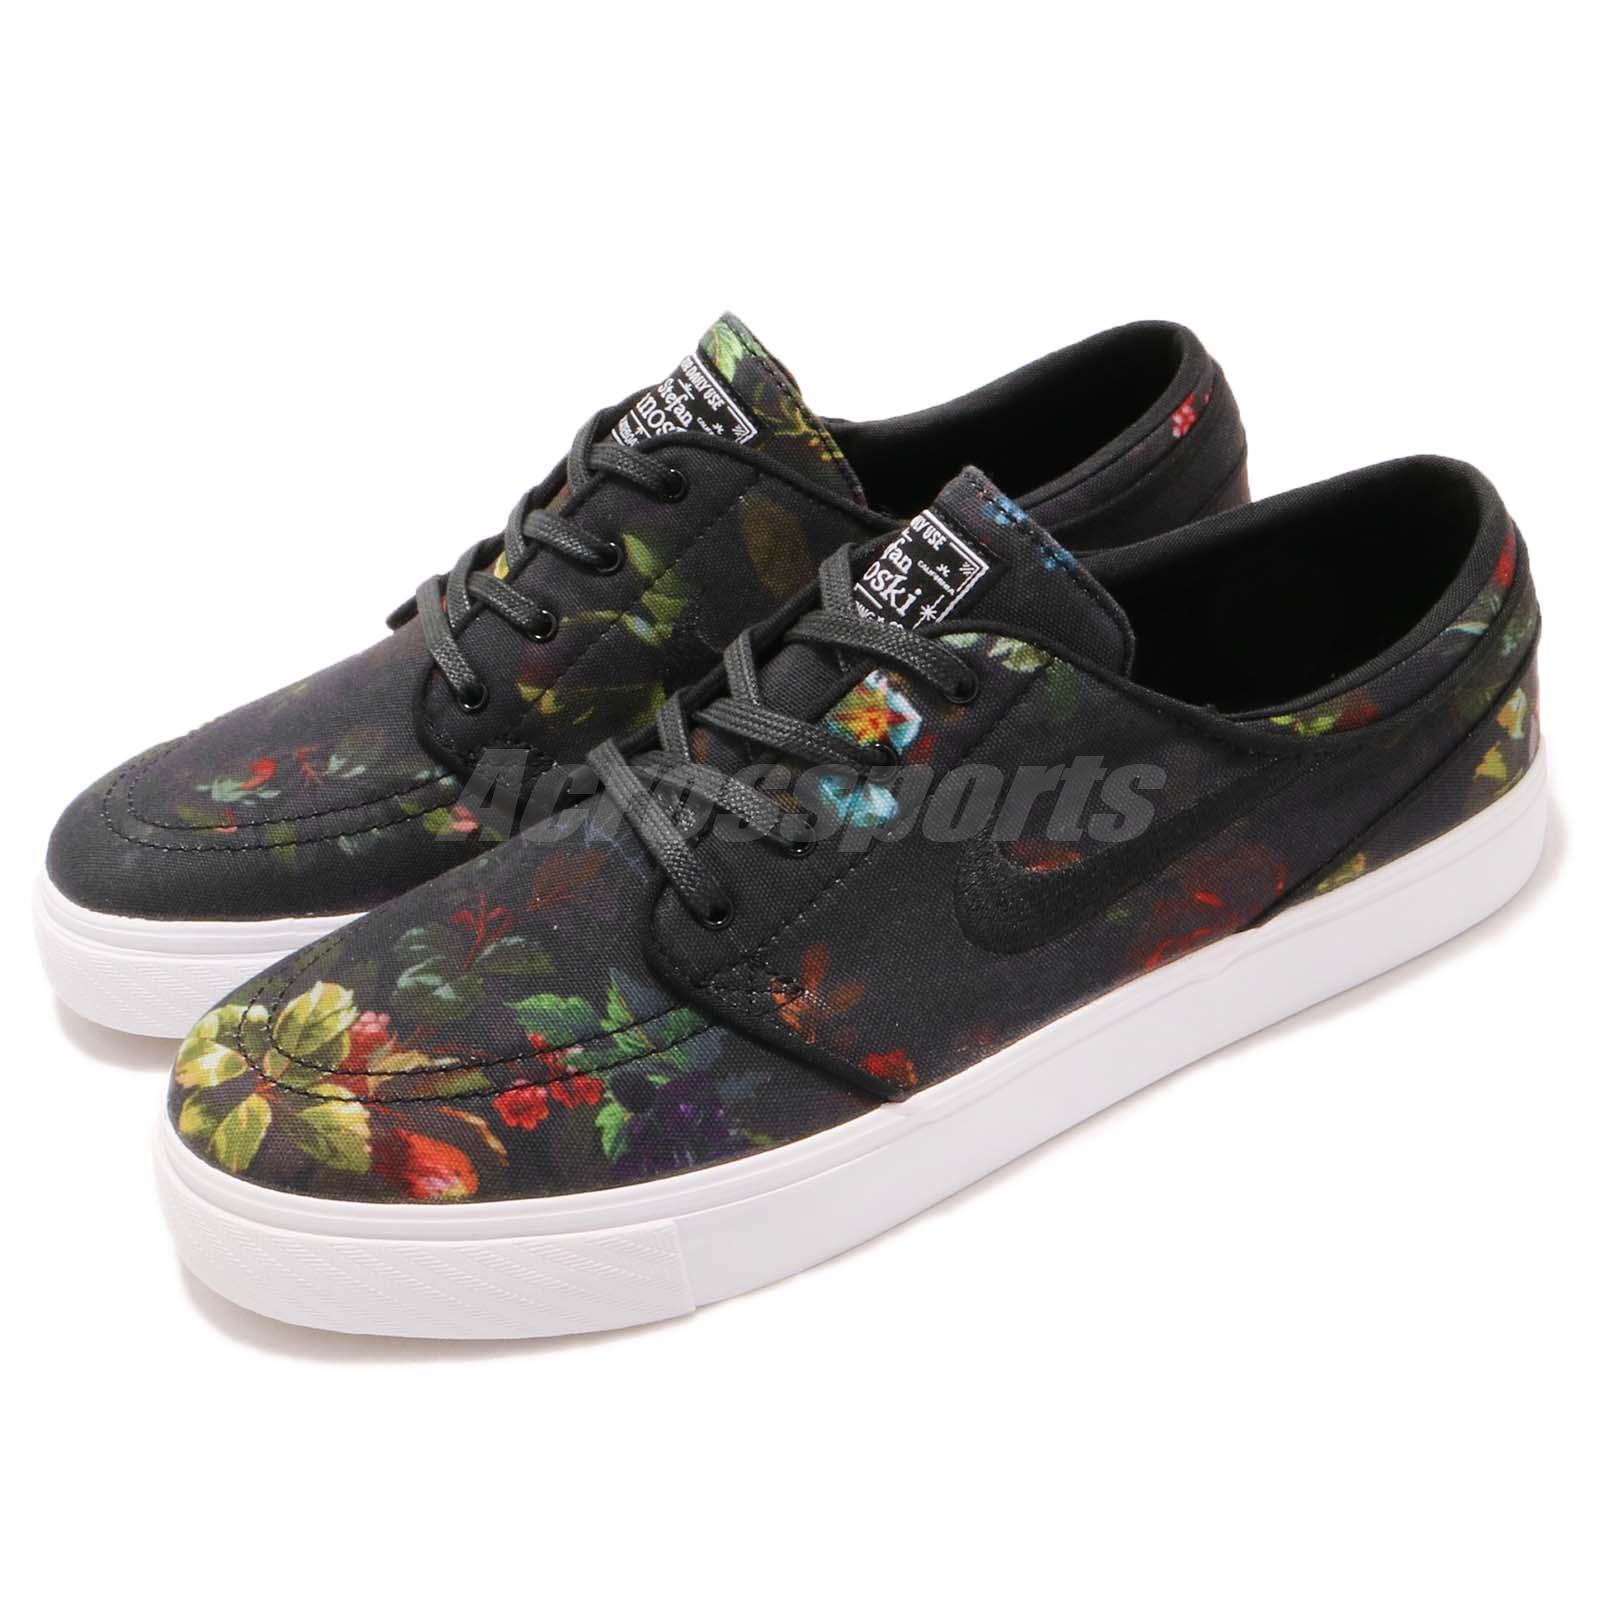 Nike SB Zoom Stefan Janoski Canvas Noir Floral Skateboarding Chaussures 615957-900